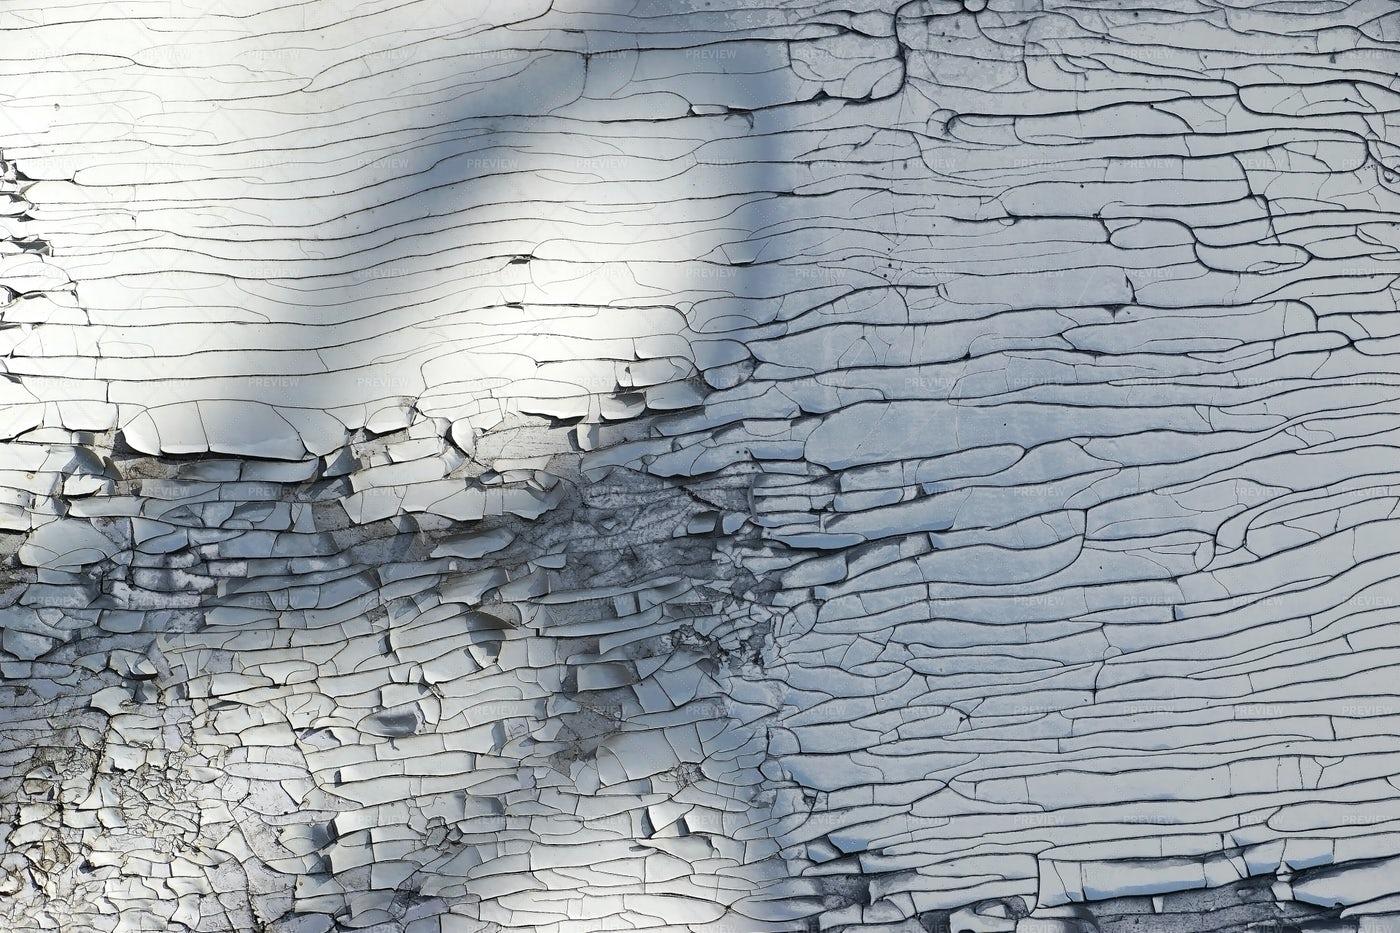 Cracking Plaster: Stock Photos